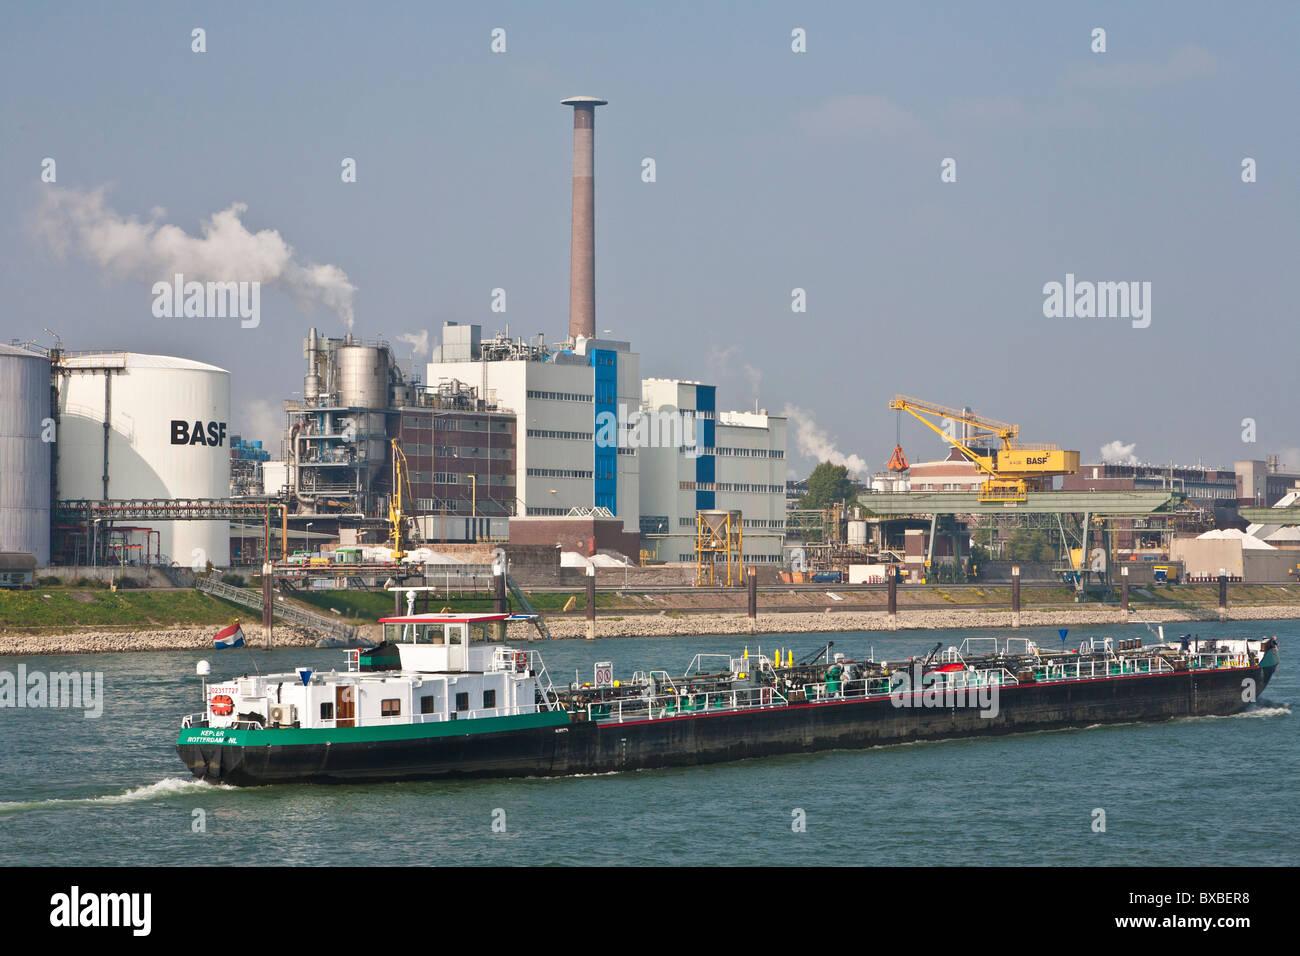 BASF CHEMICAL INDUSTRY, BARGE, RHEIN RIVER, LUDWIGSHAFEN AM RHEIN, RHINELAND-PALATINATE, GERMANY - Stock Image